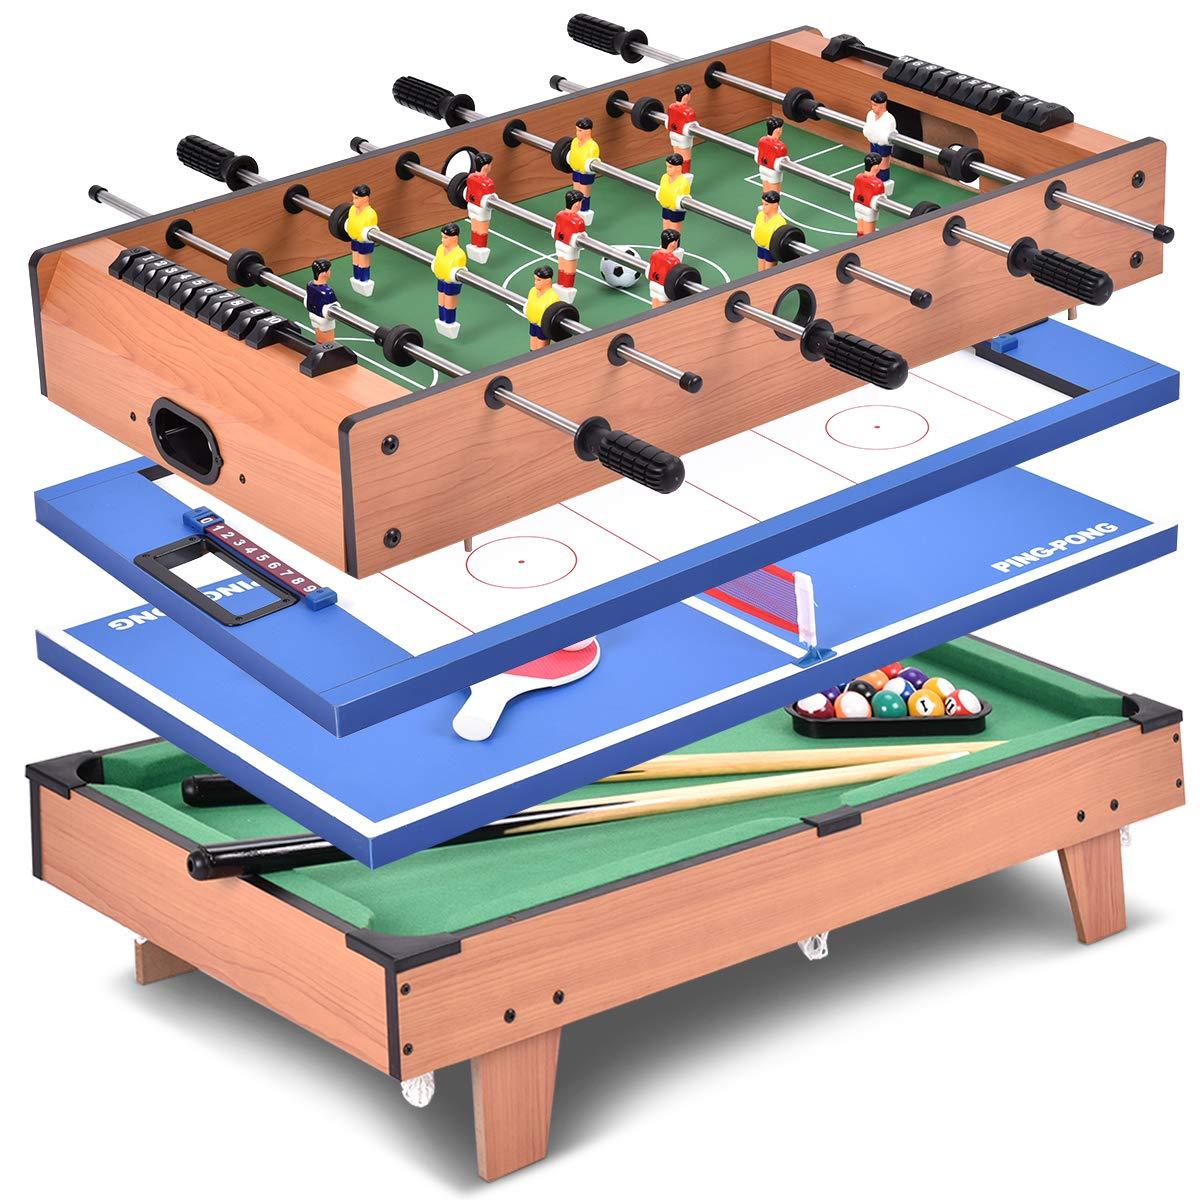 Giantex Multi Game Table Pool Hockey Foosball Table Tennis Billiard Combination Game Table (4 in 1) by Giantex